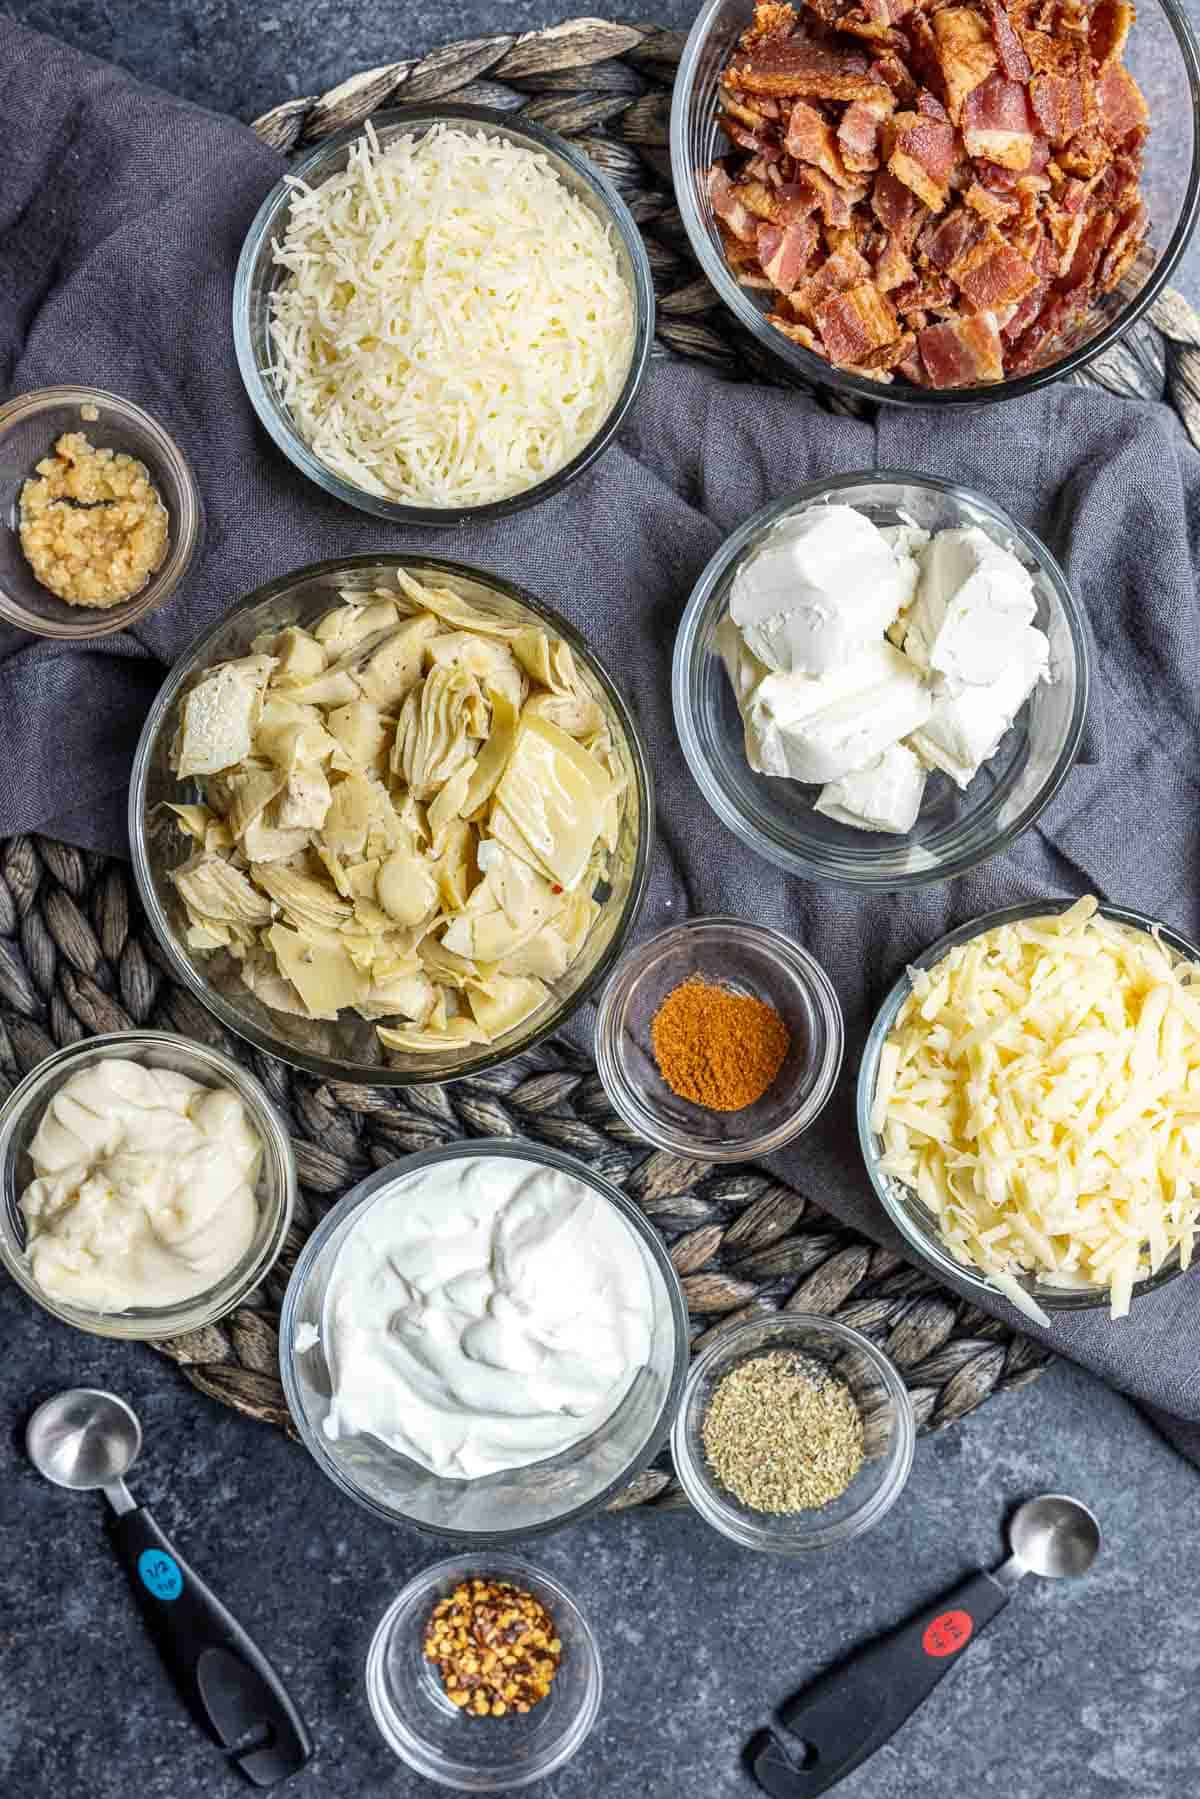 ingredients for Bacon Artichoke Dip